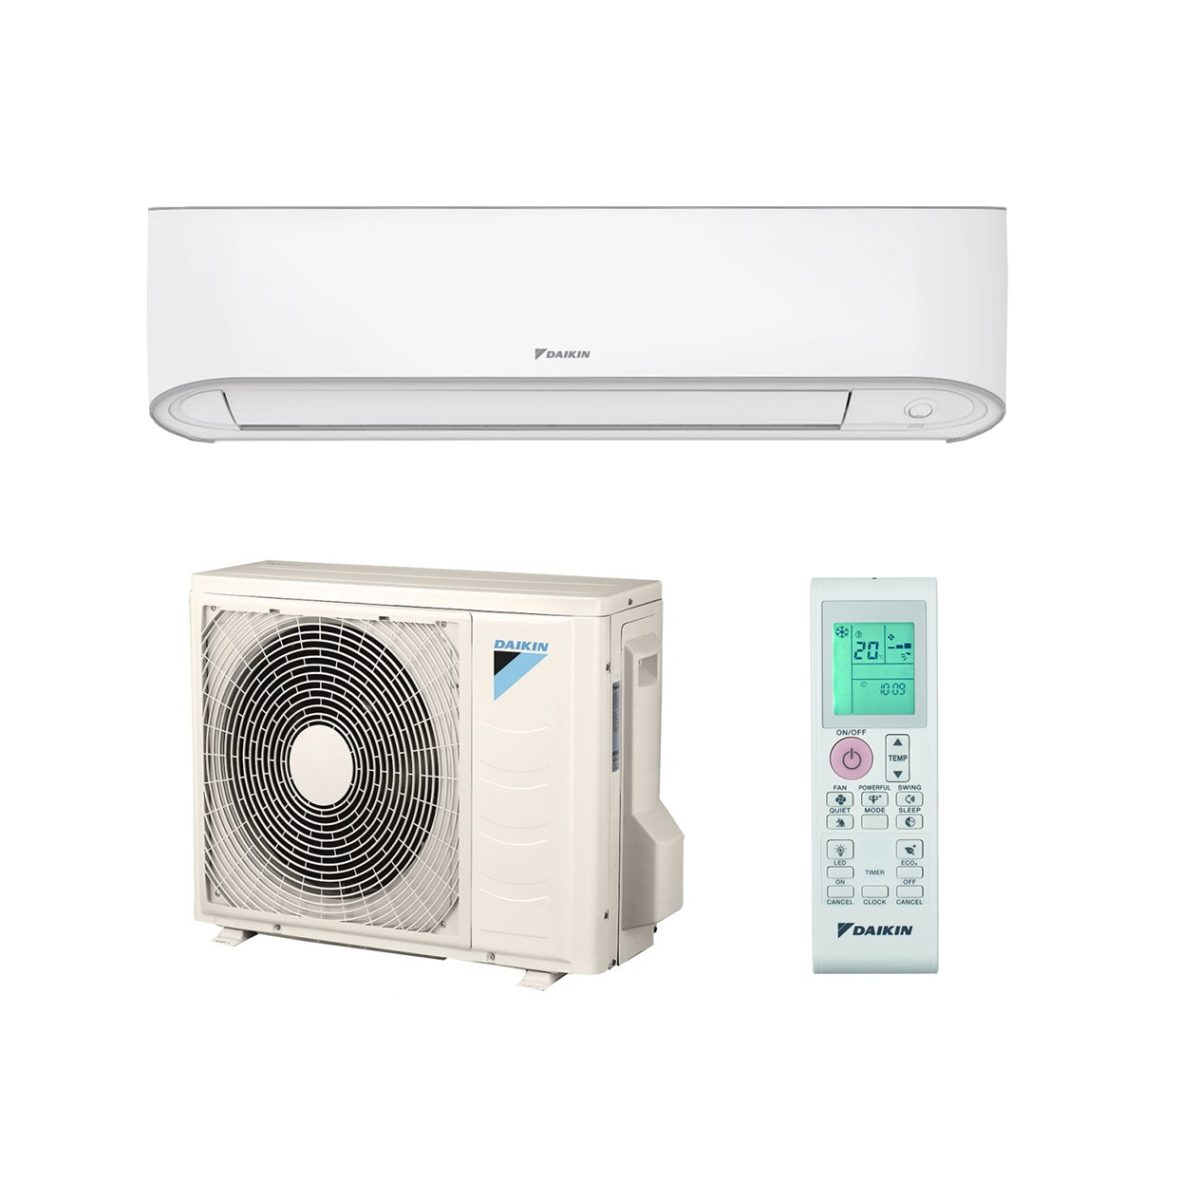 kondicioner-daikin-ftxk60aw-1